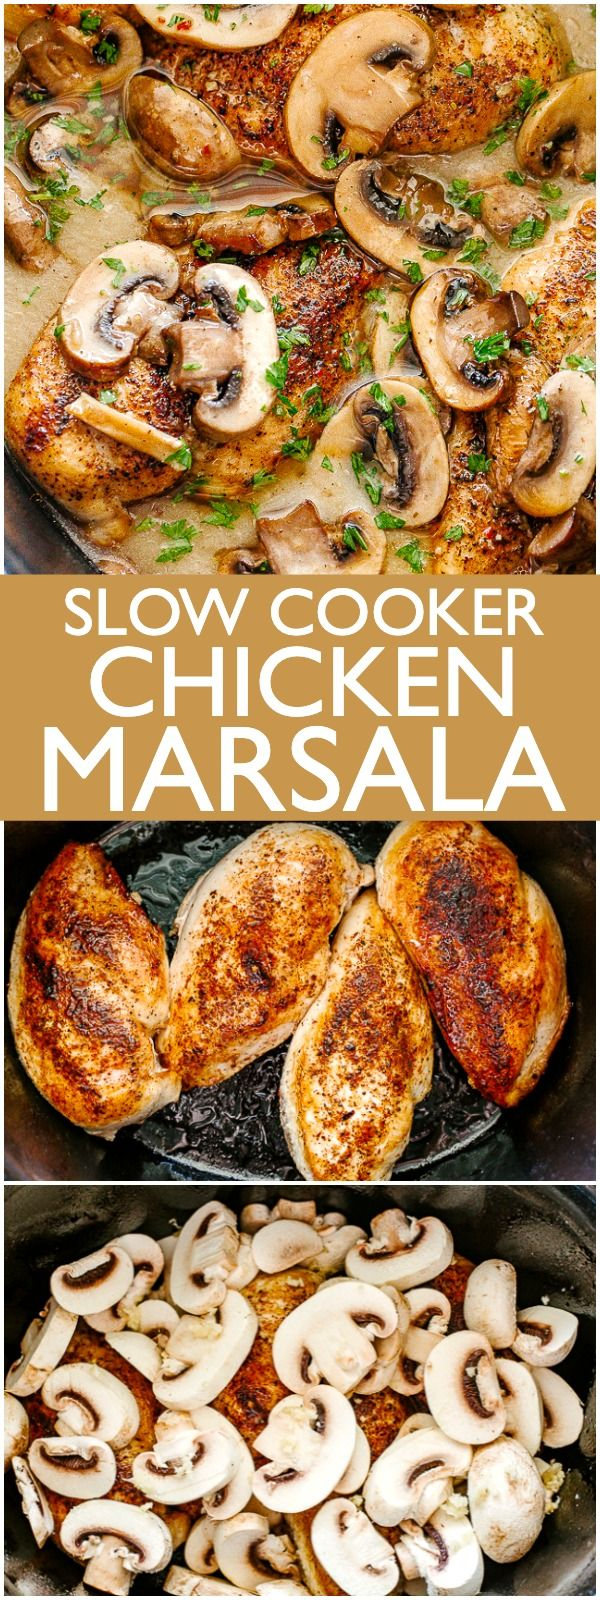 Photo of Slow Cooker Chicken Marsala